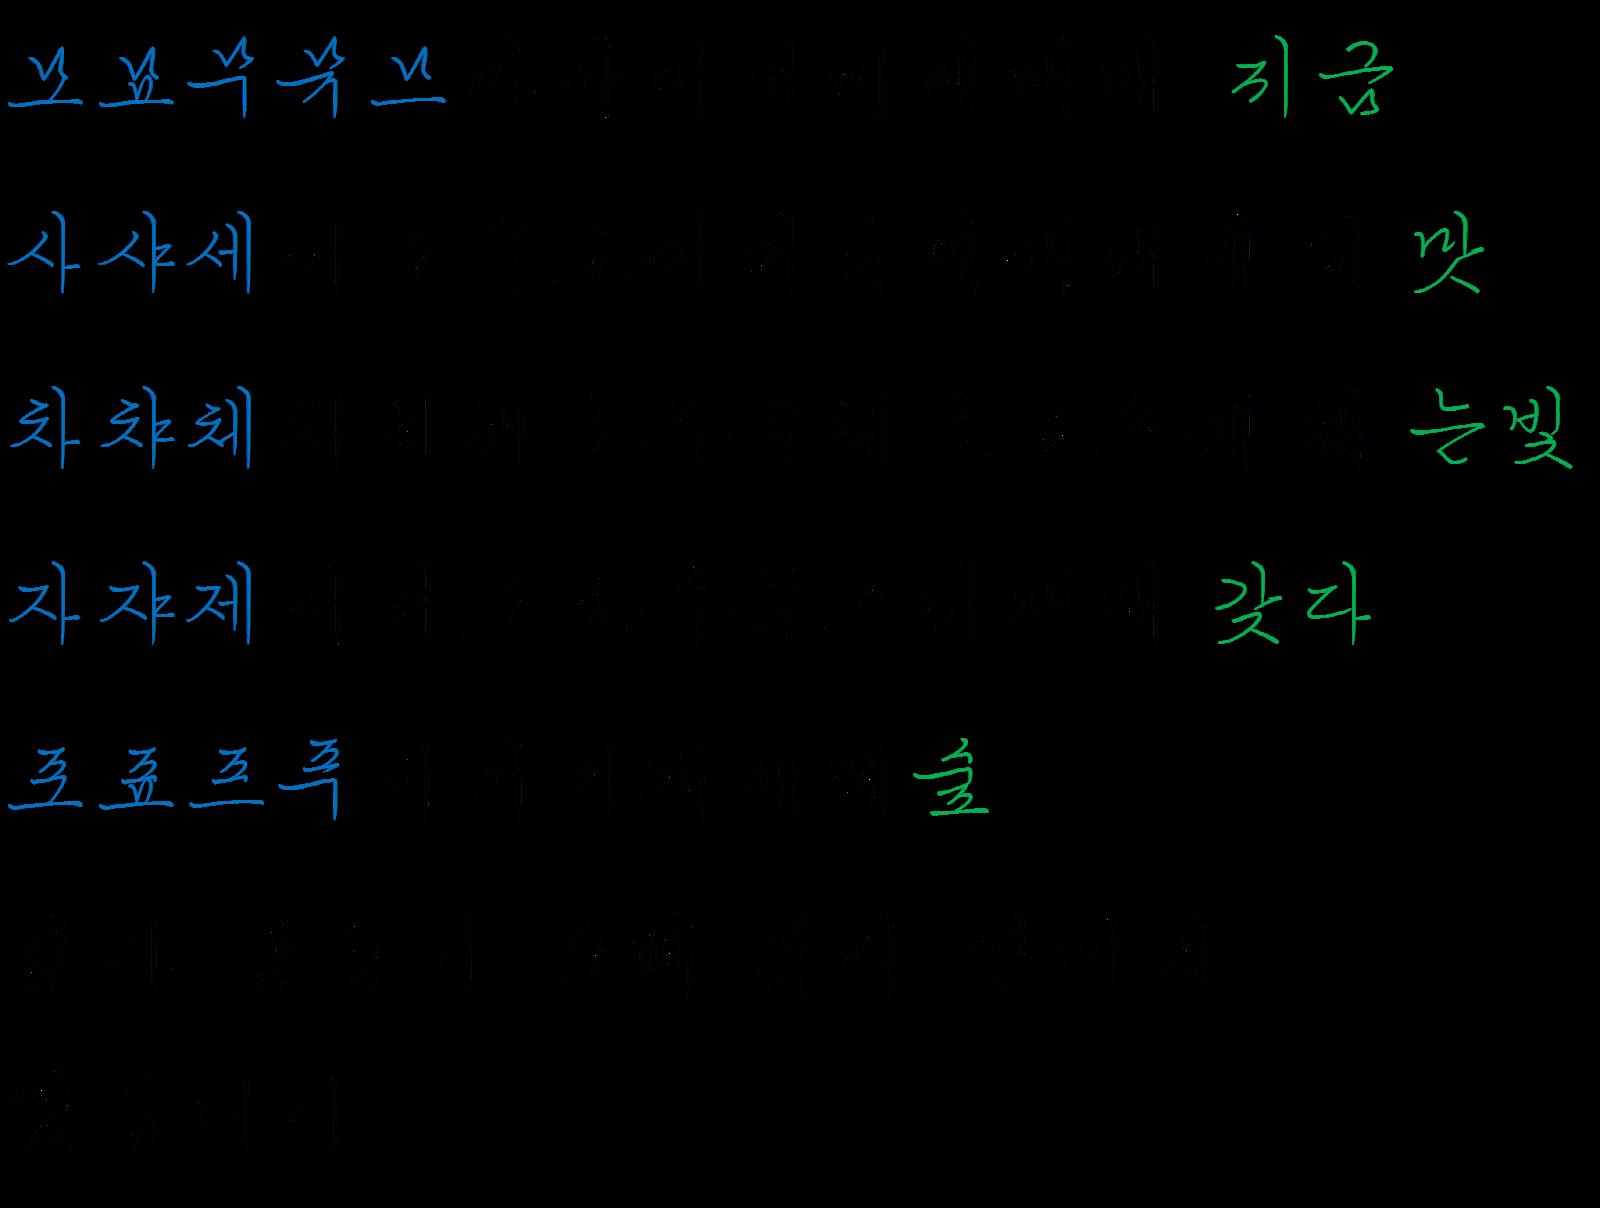 Bajan Language Lover Korean Handwriting